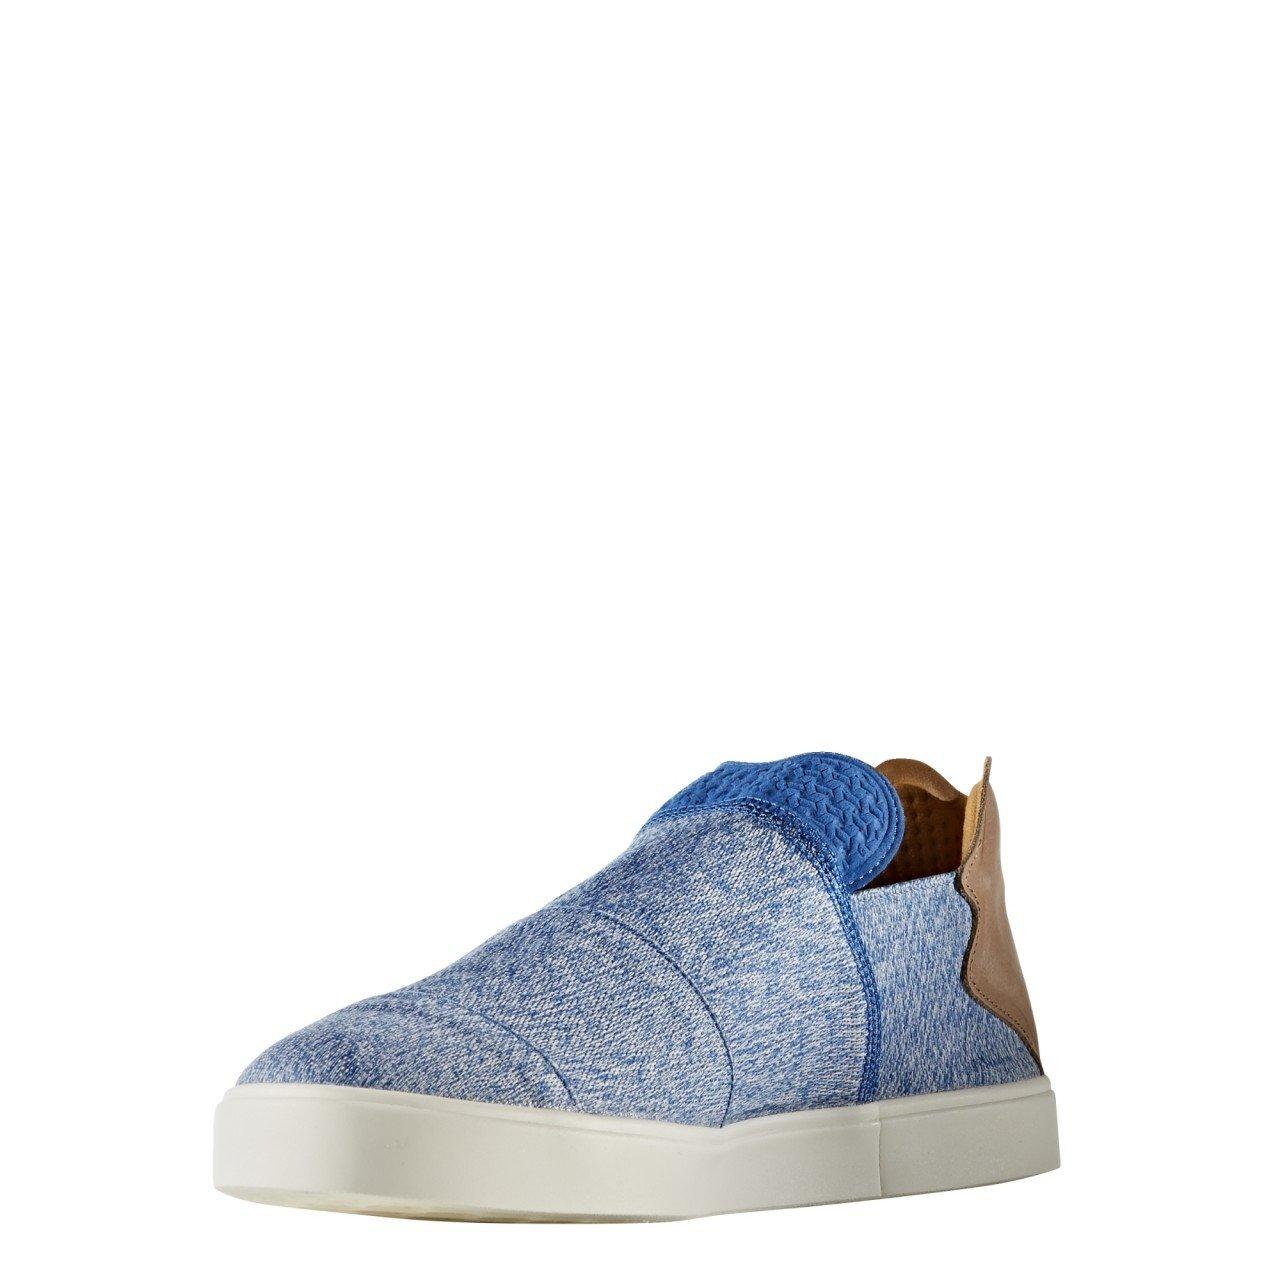 Adidas Originals VULC SLIP ON PHARRELL WILLIAMS Chaussures